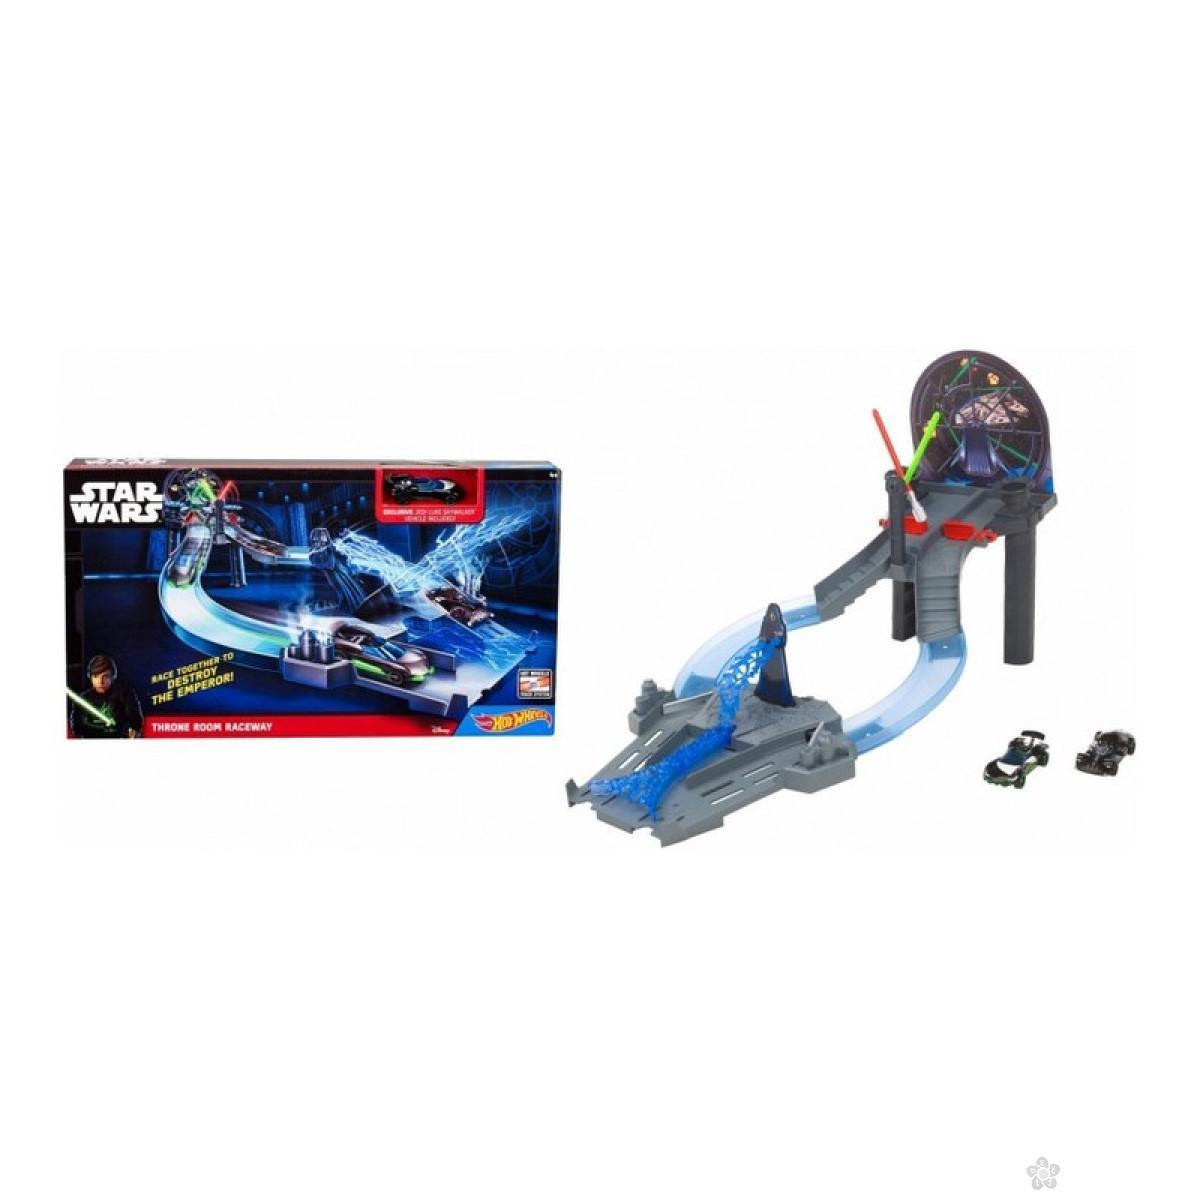 Hot Wheels staza Star Wars Throne Room Raceway CHB13